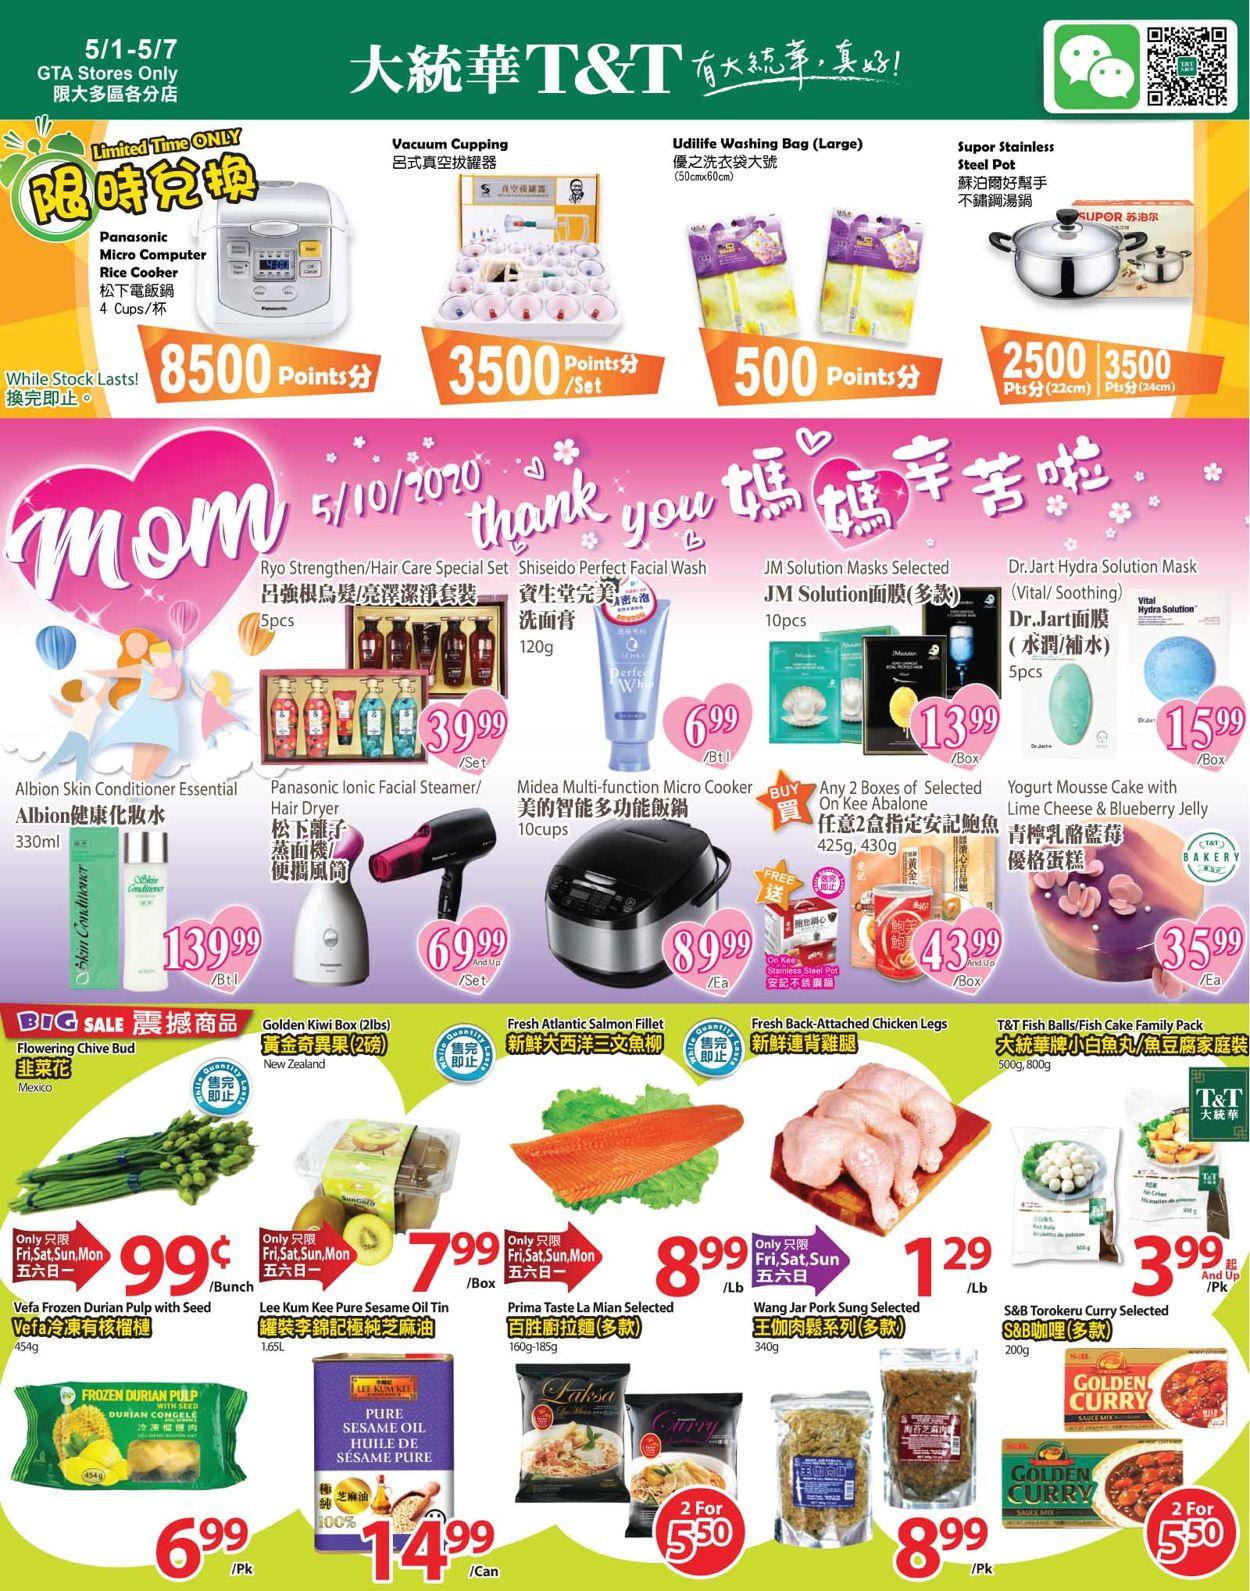 T&T Supermarket Flyer - 05/01-05/07/2020